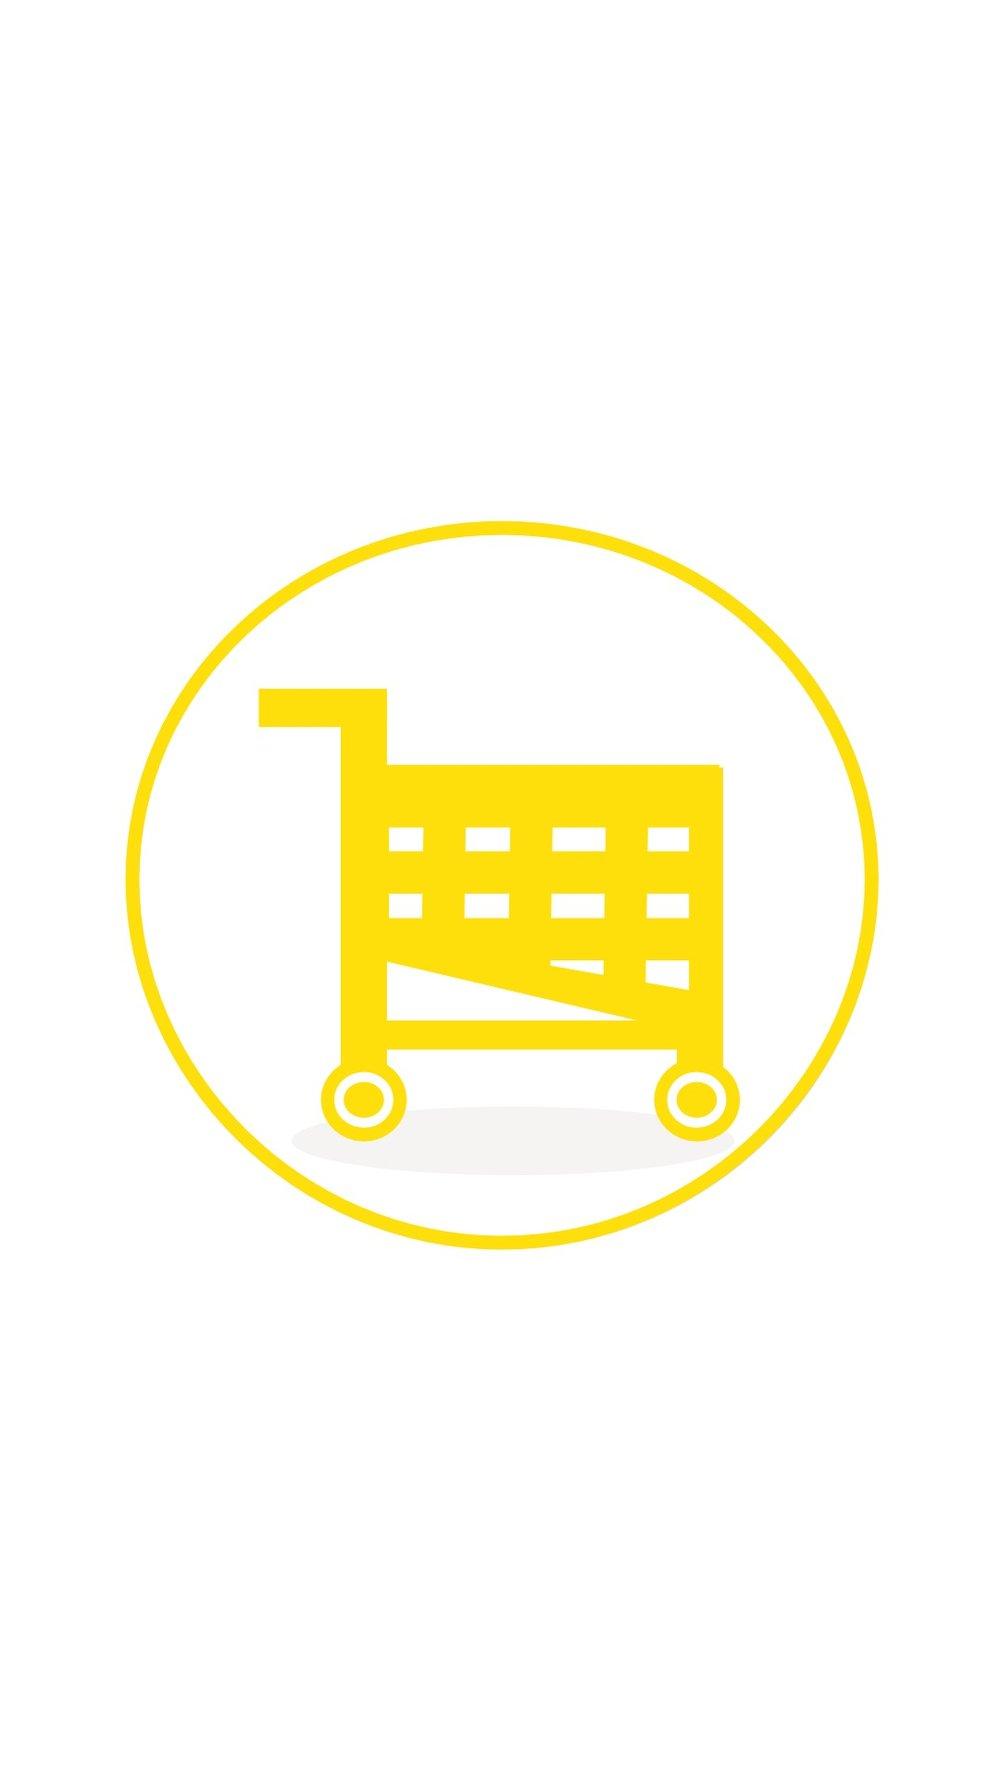 Instagram-cover-shoppingcar-yellow-white-madebylottyvargas-lotnotes.jpg